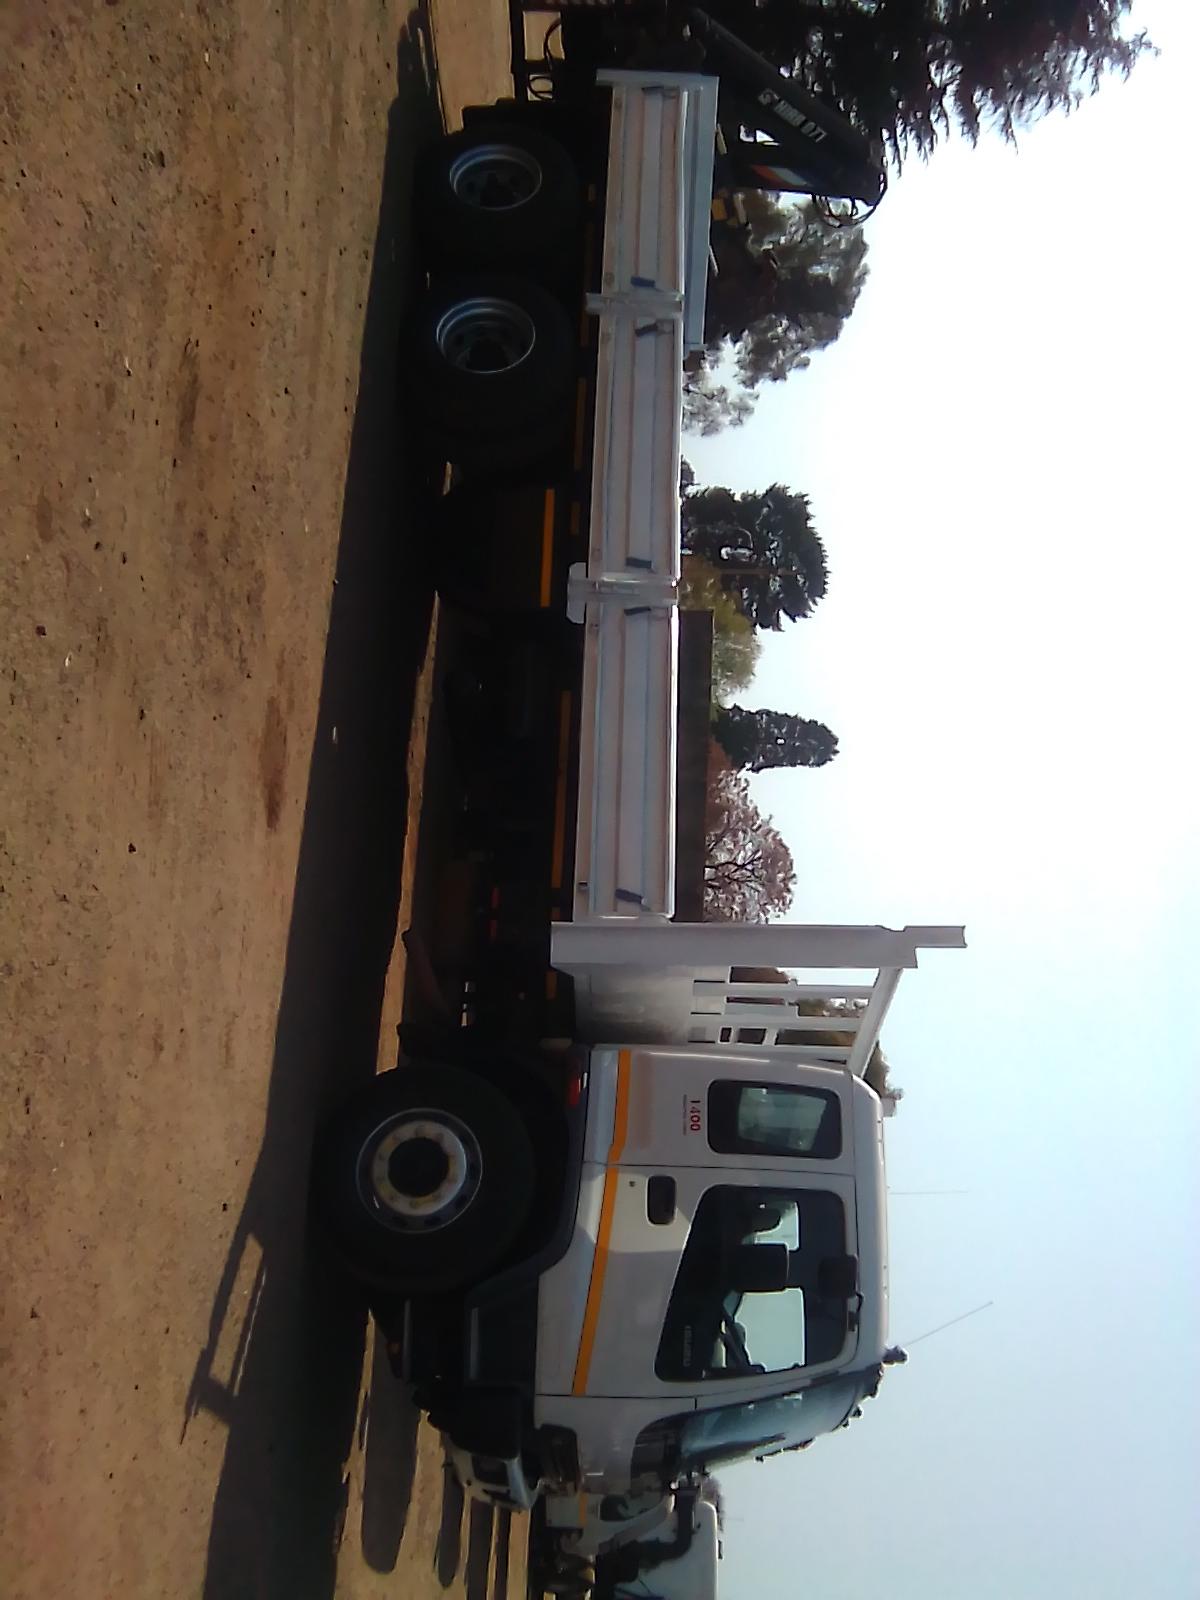 10 Ton Truck with Crane